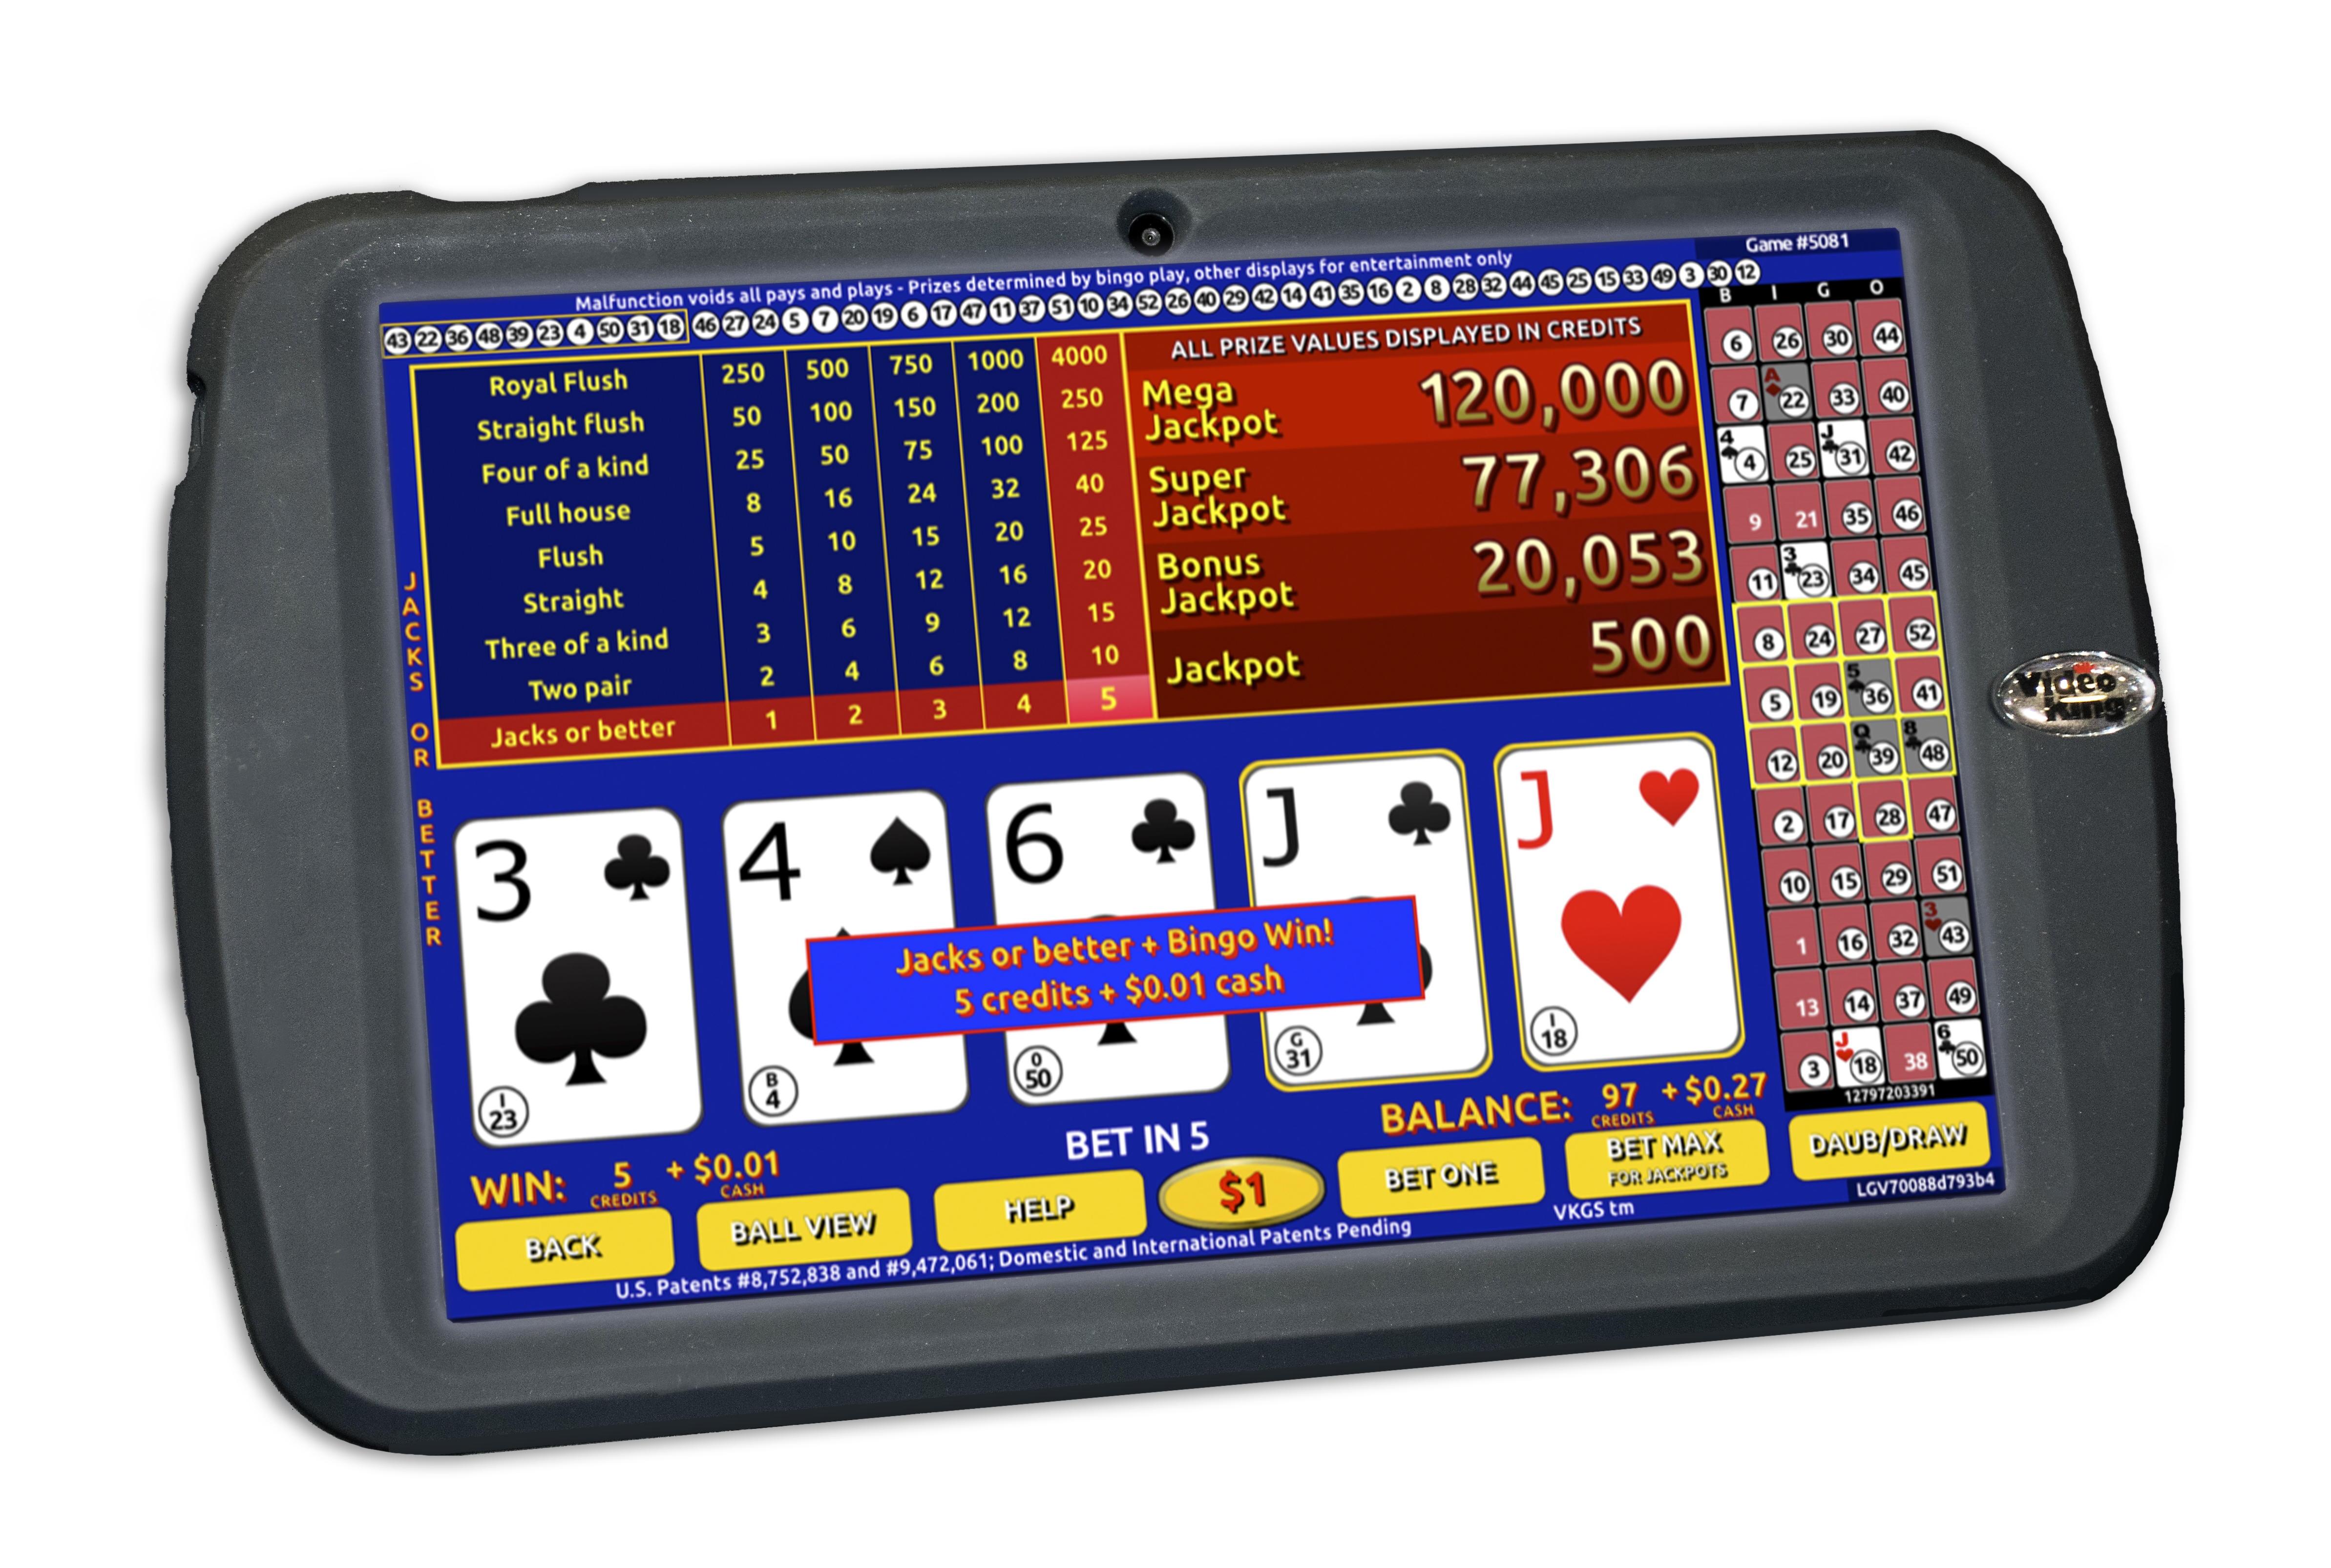 $640 free chip casino at Casino Dingo